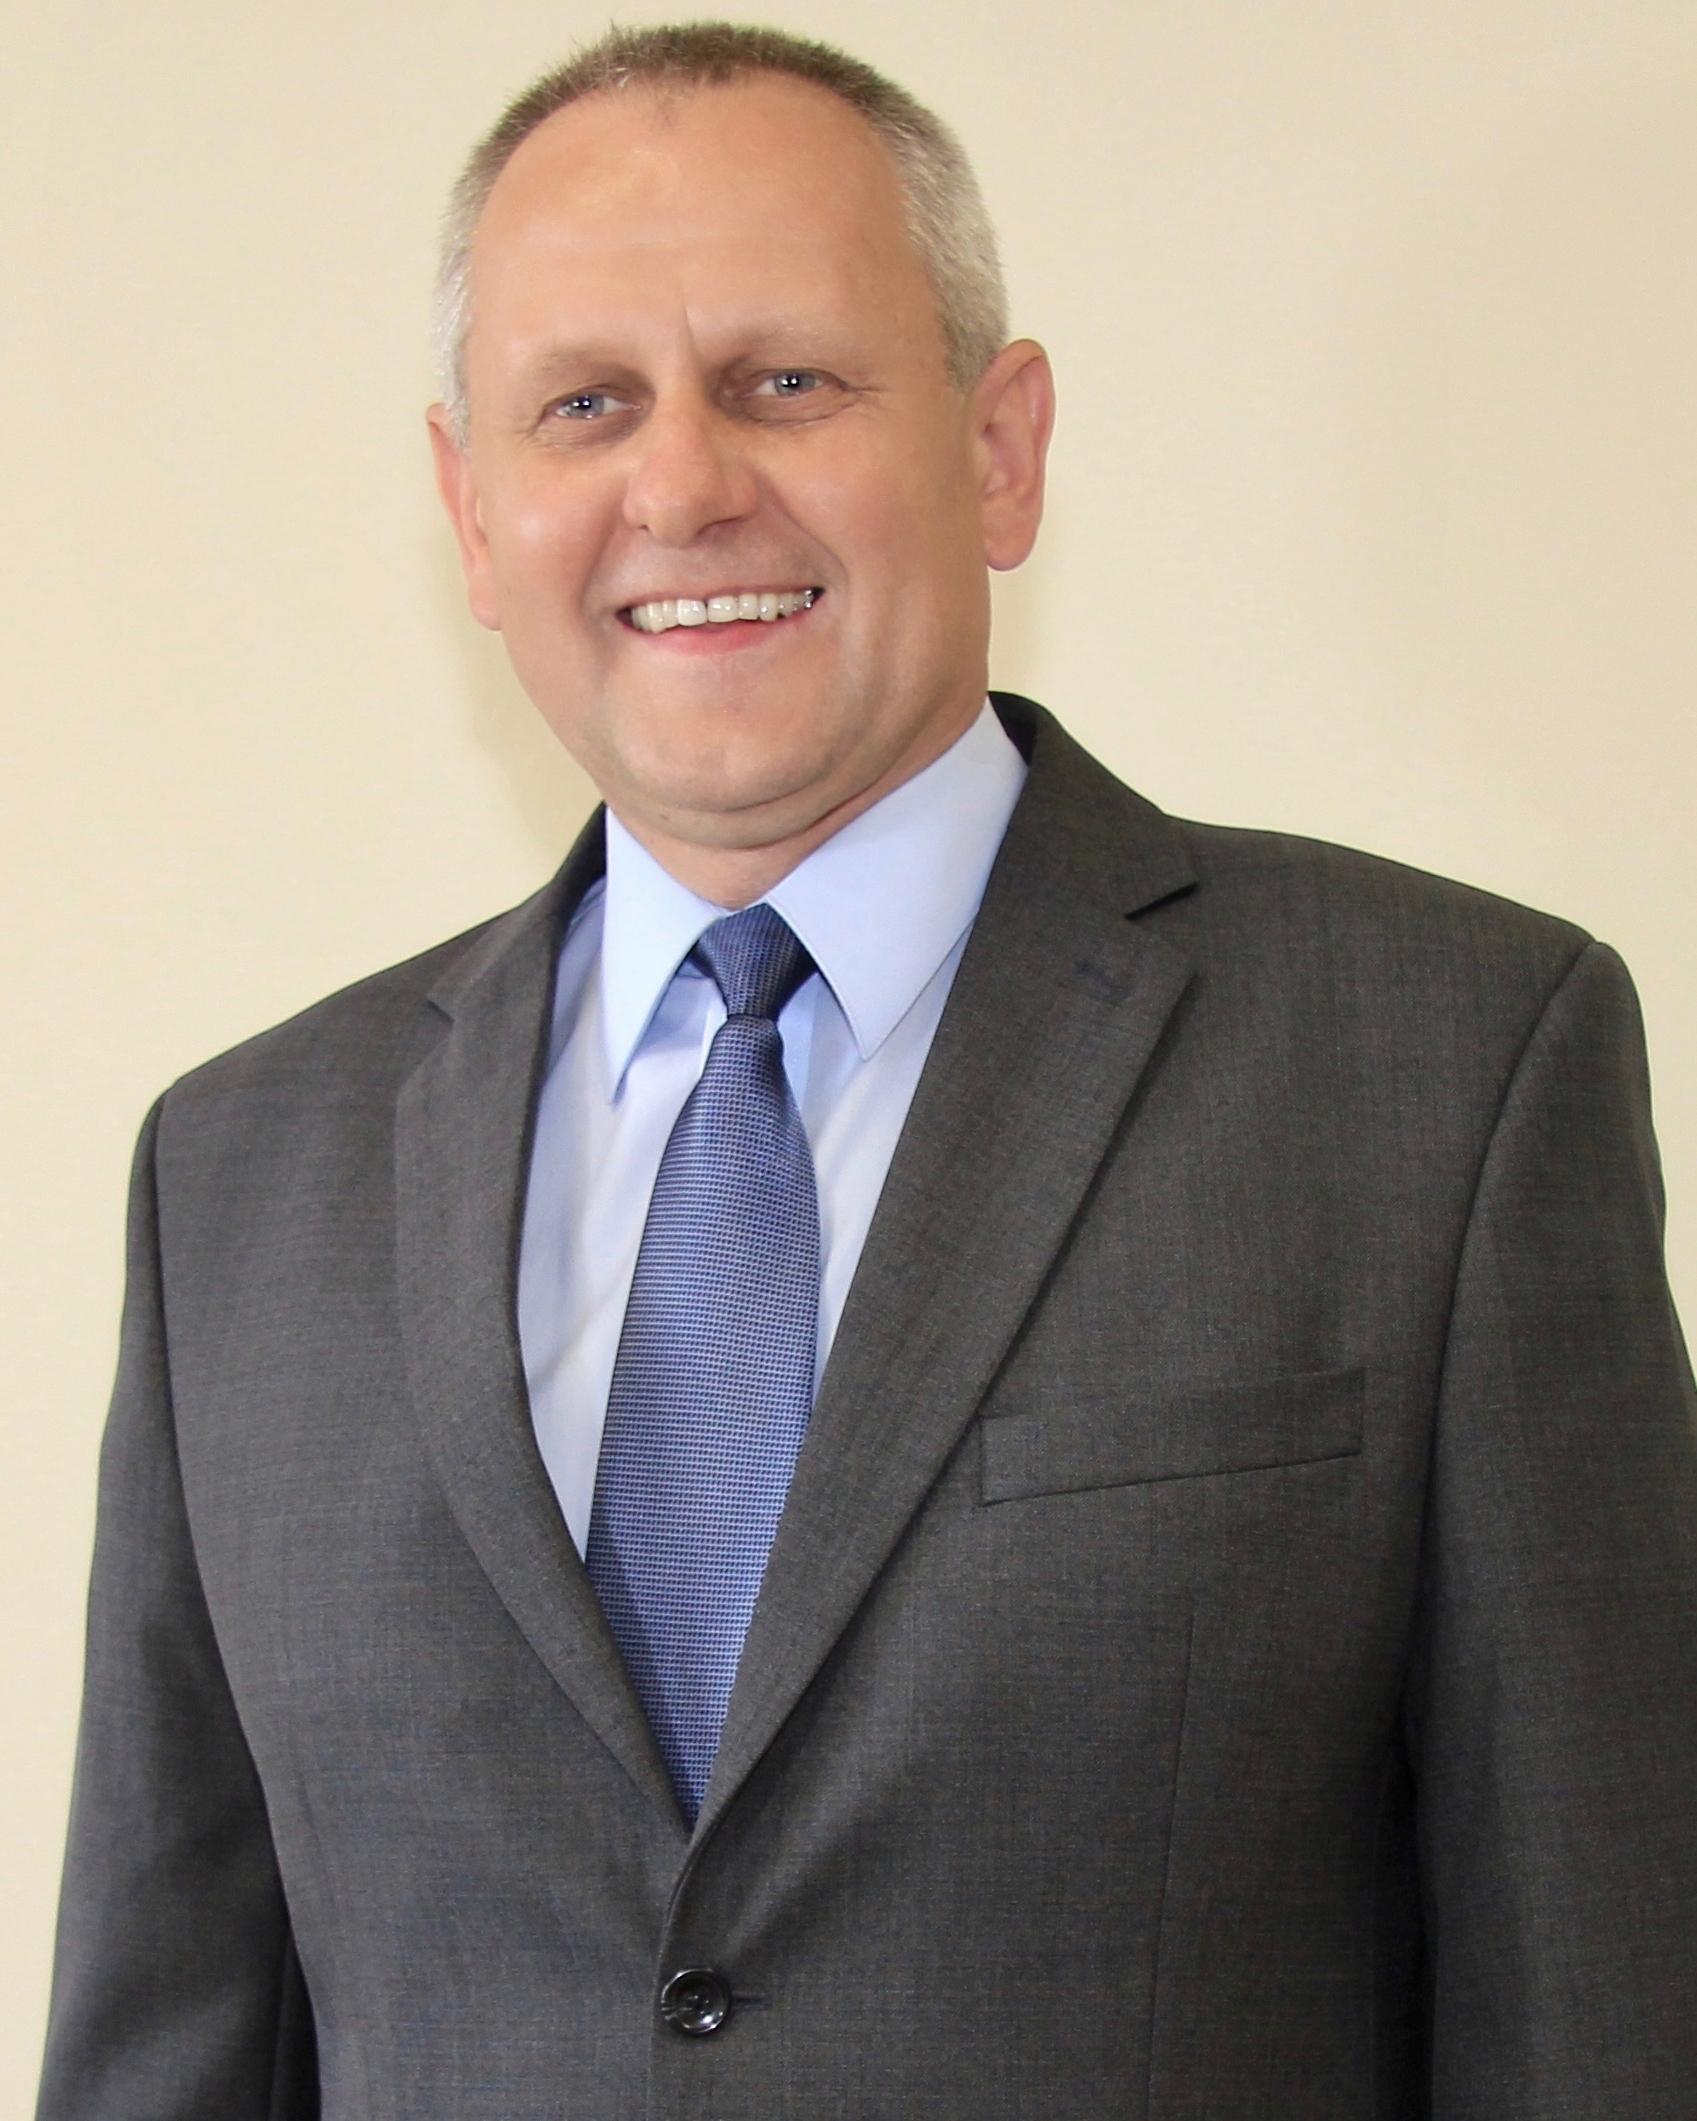 Gintaras Strelčiūnas